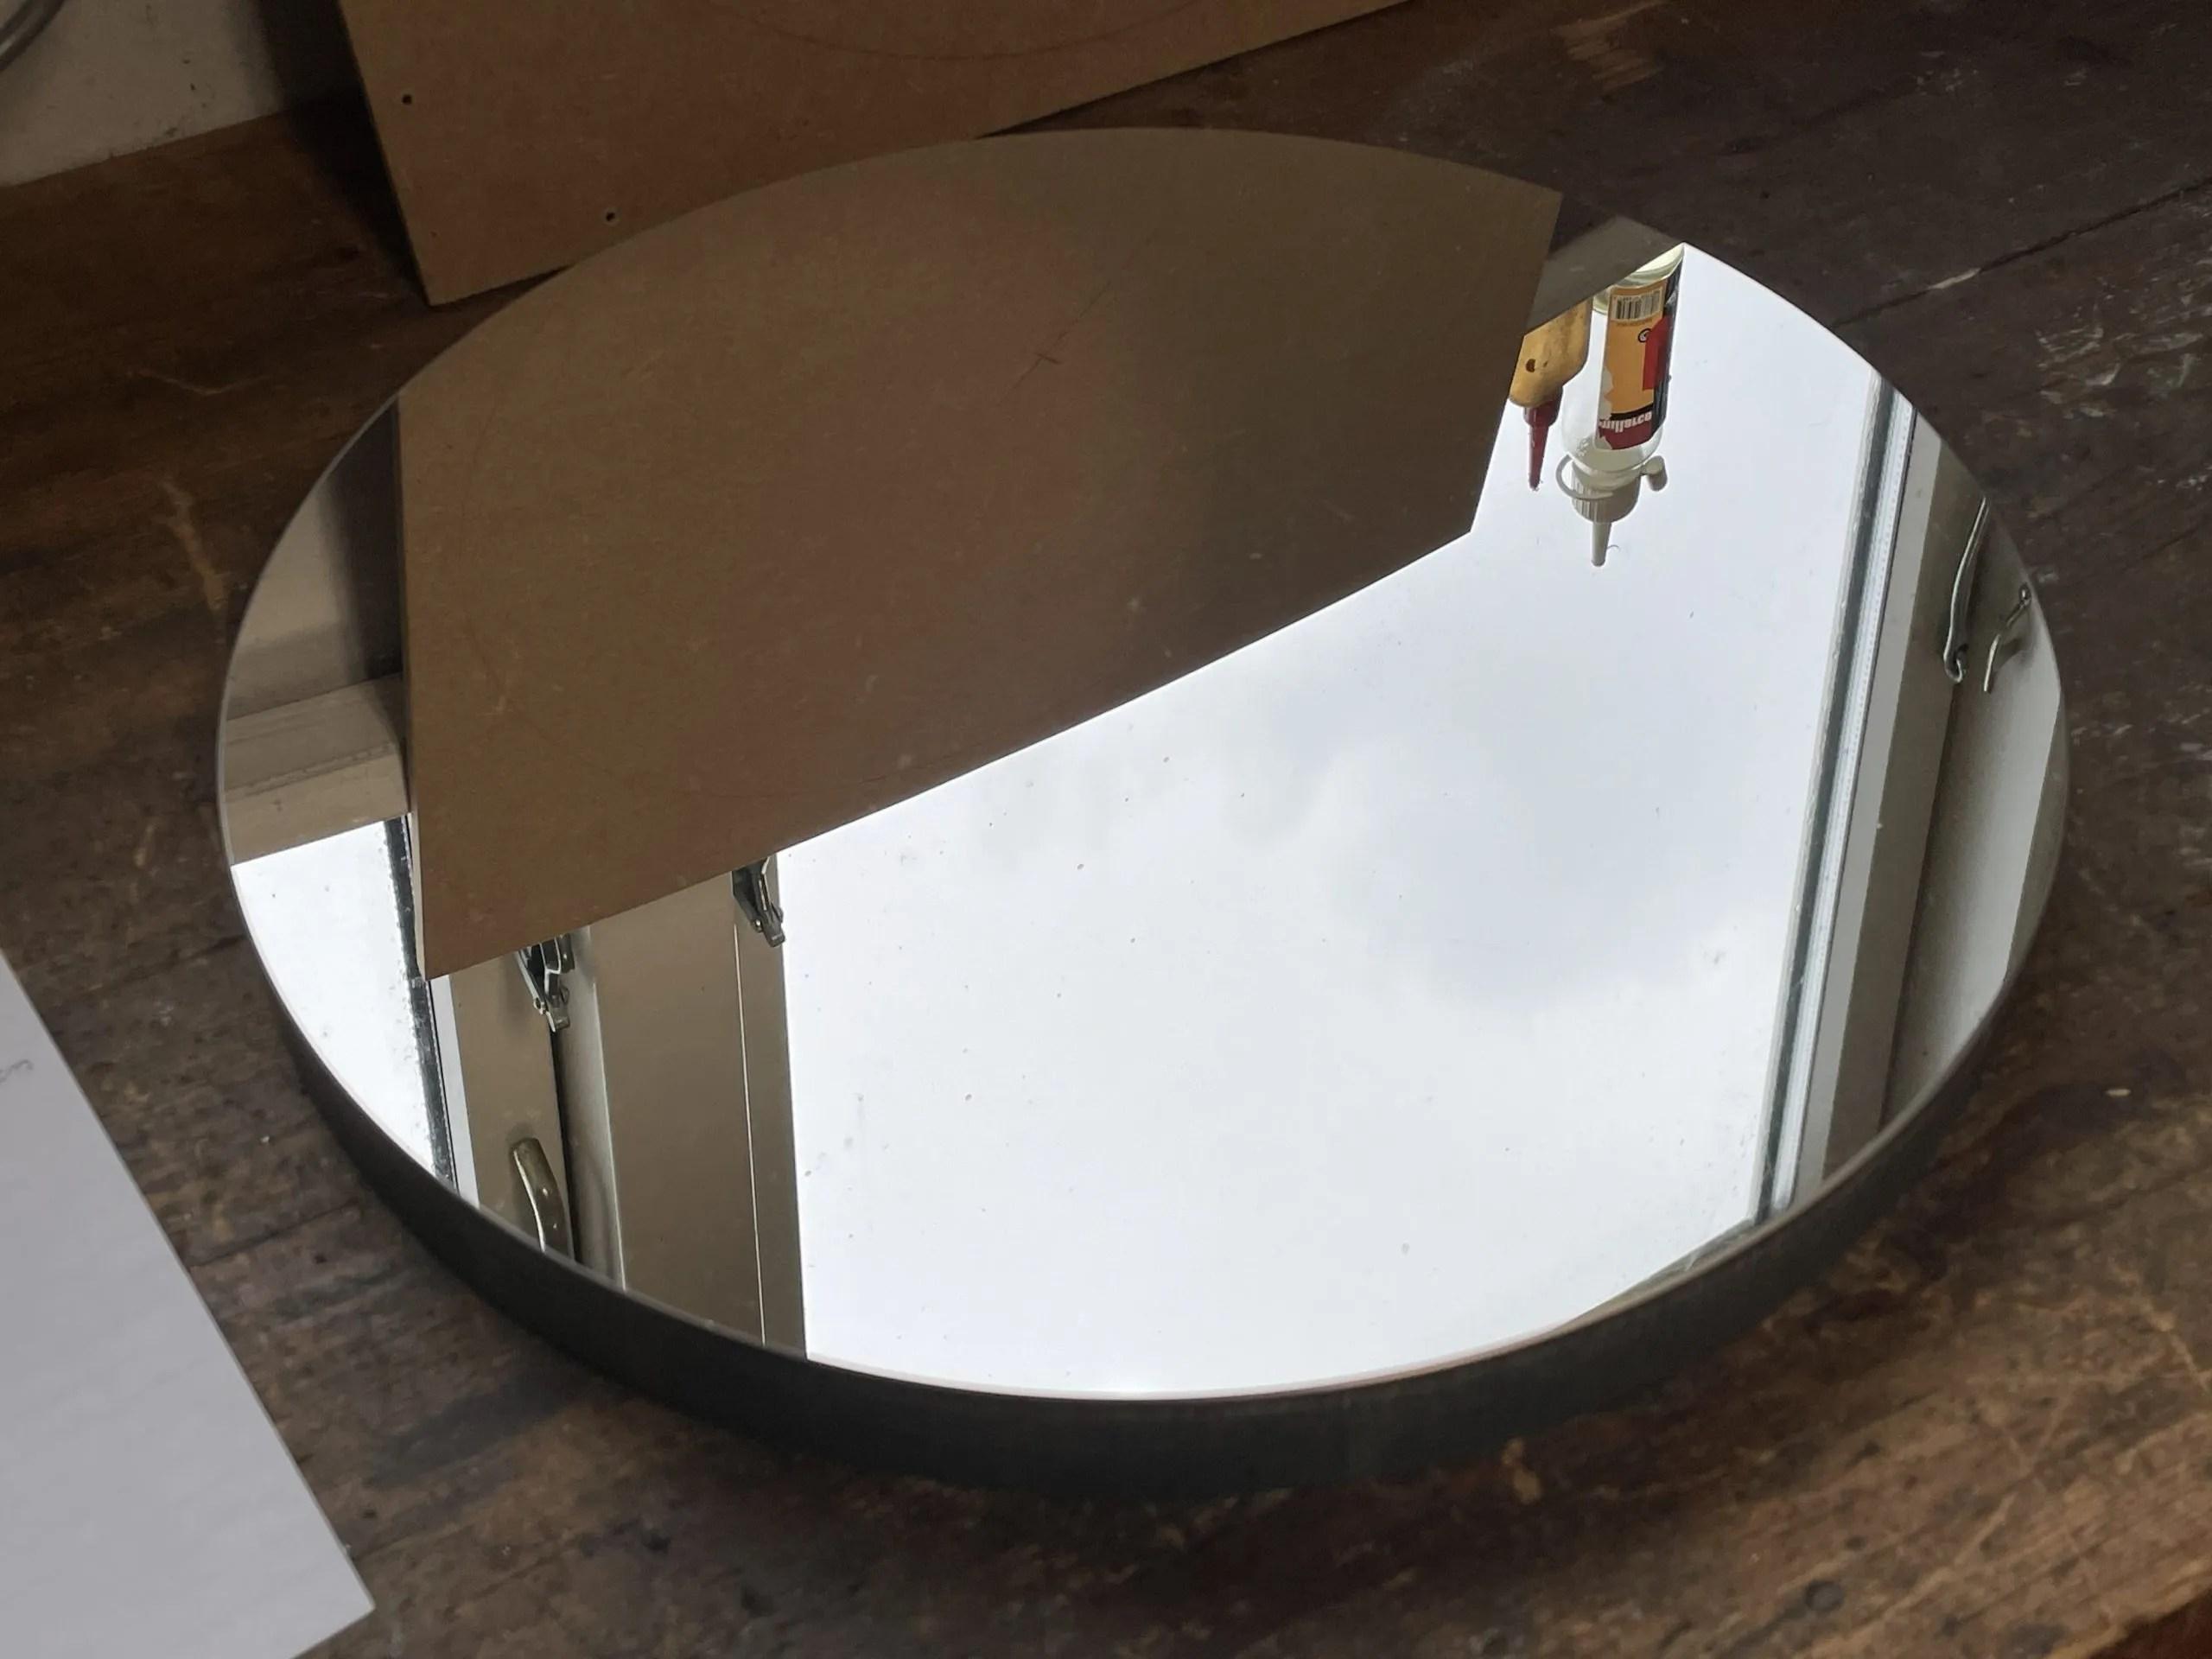 mirror_unpacked